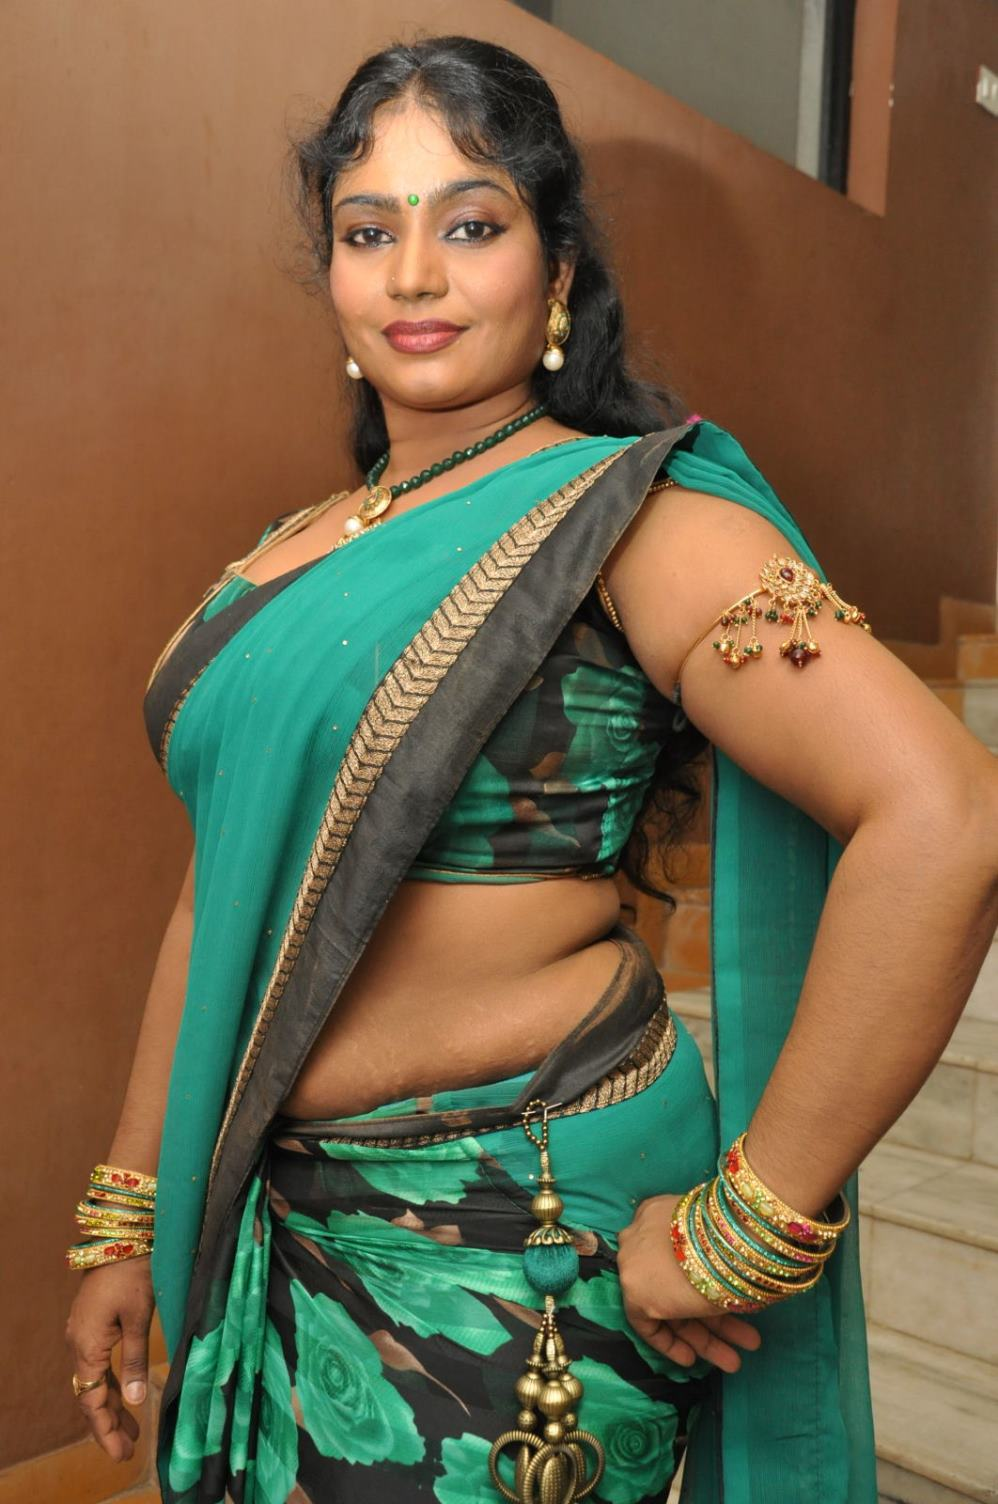 Supporting Actress Jayavani Hot Stills In Saree Hq -2315